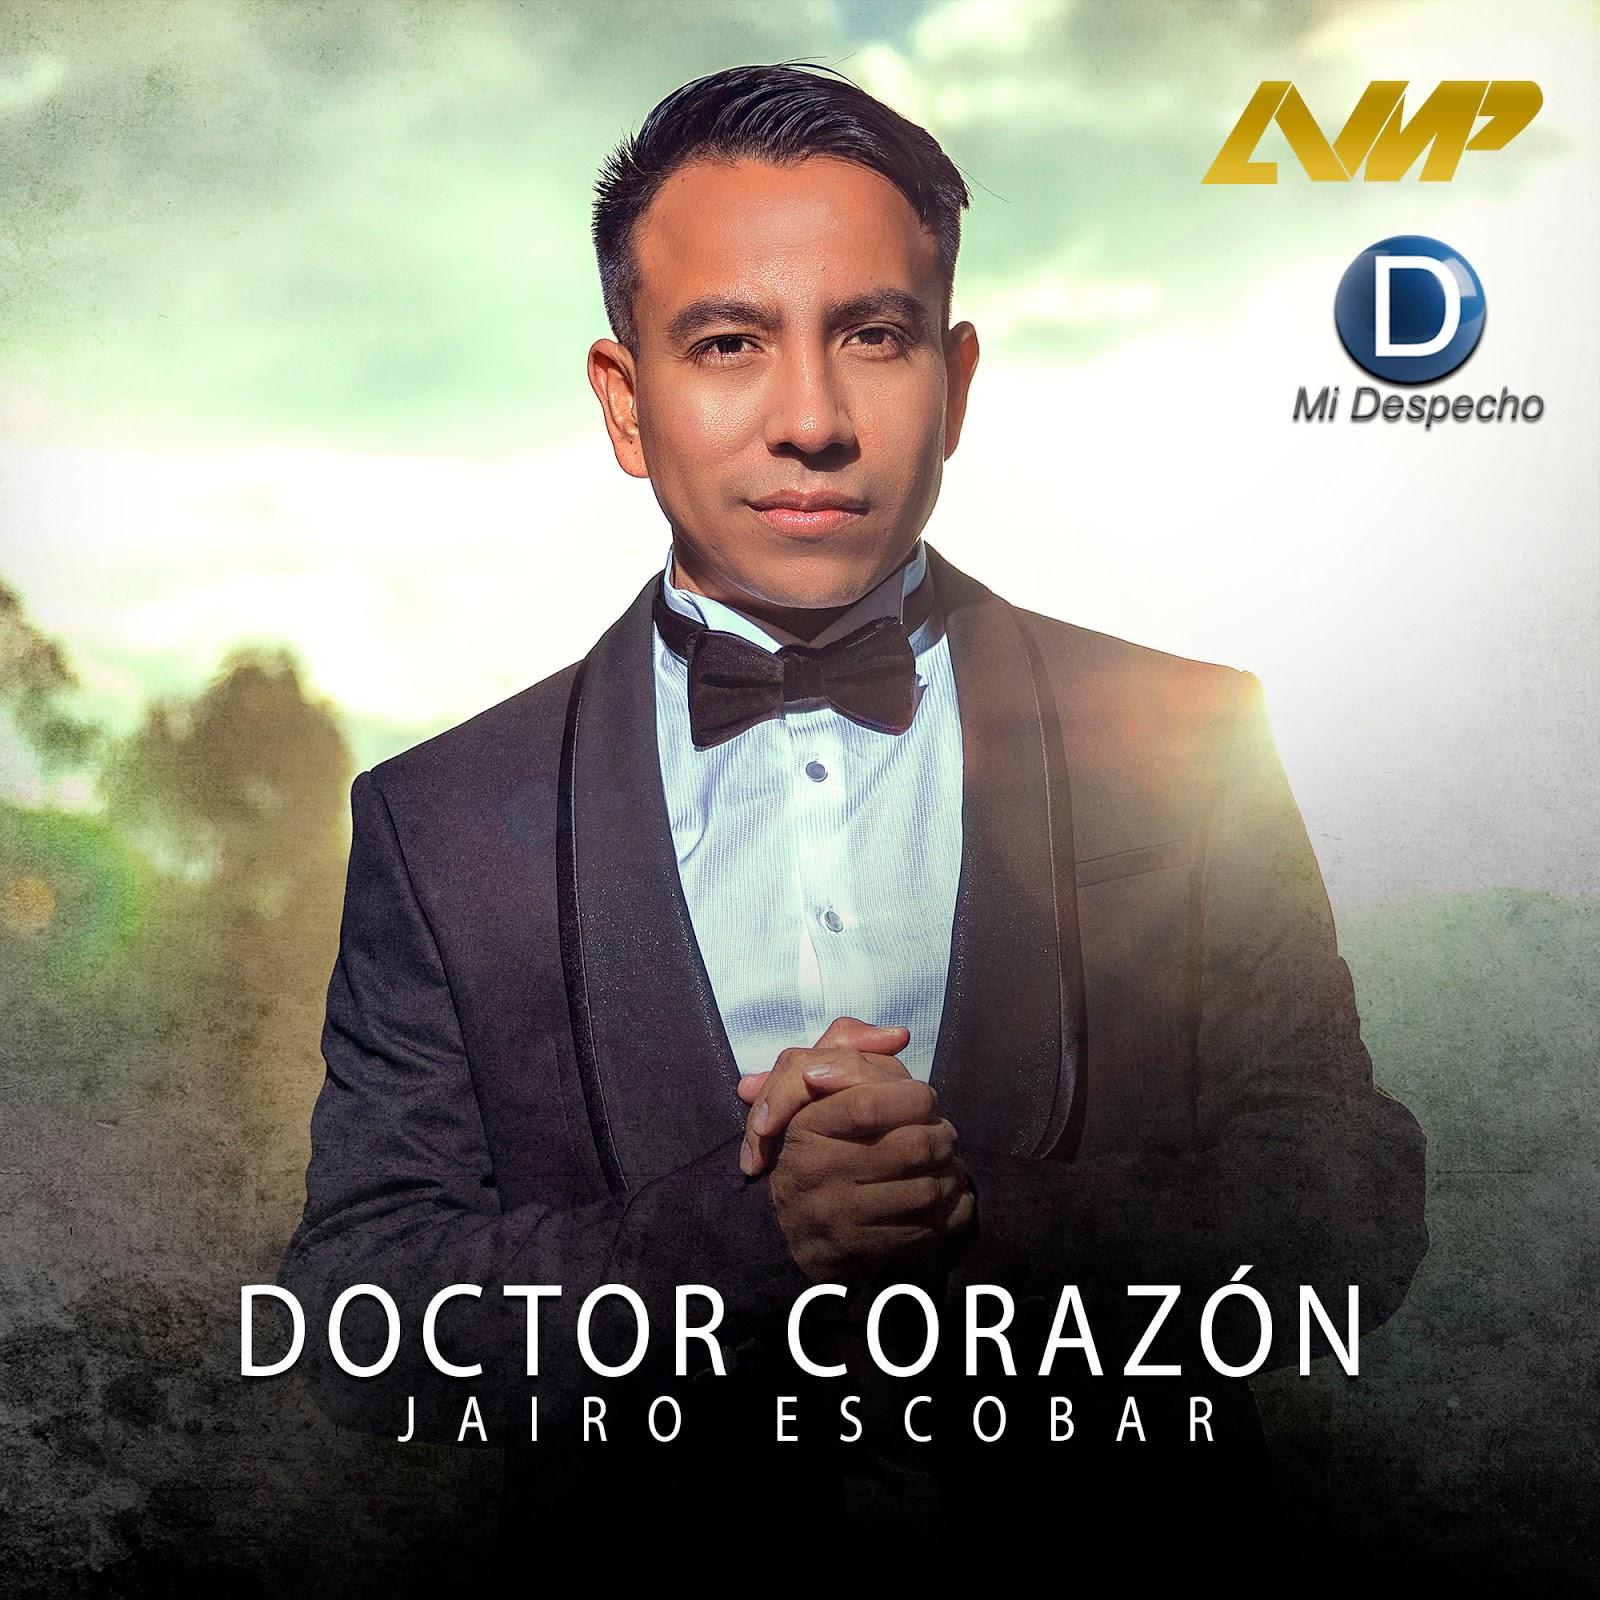 Jairo Escobar Doctor Corazon